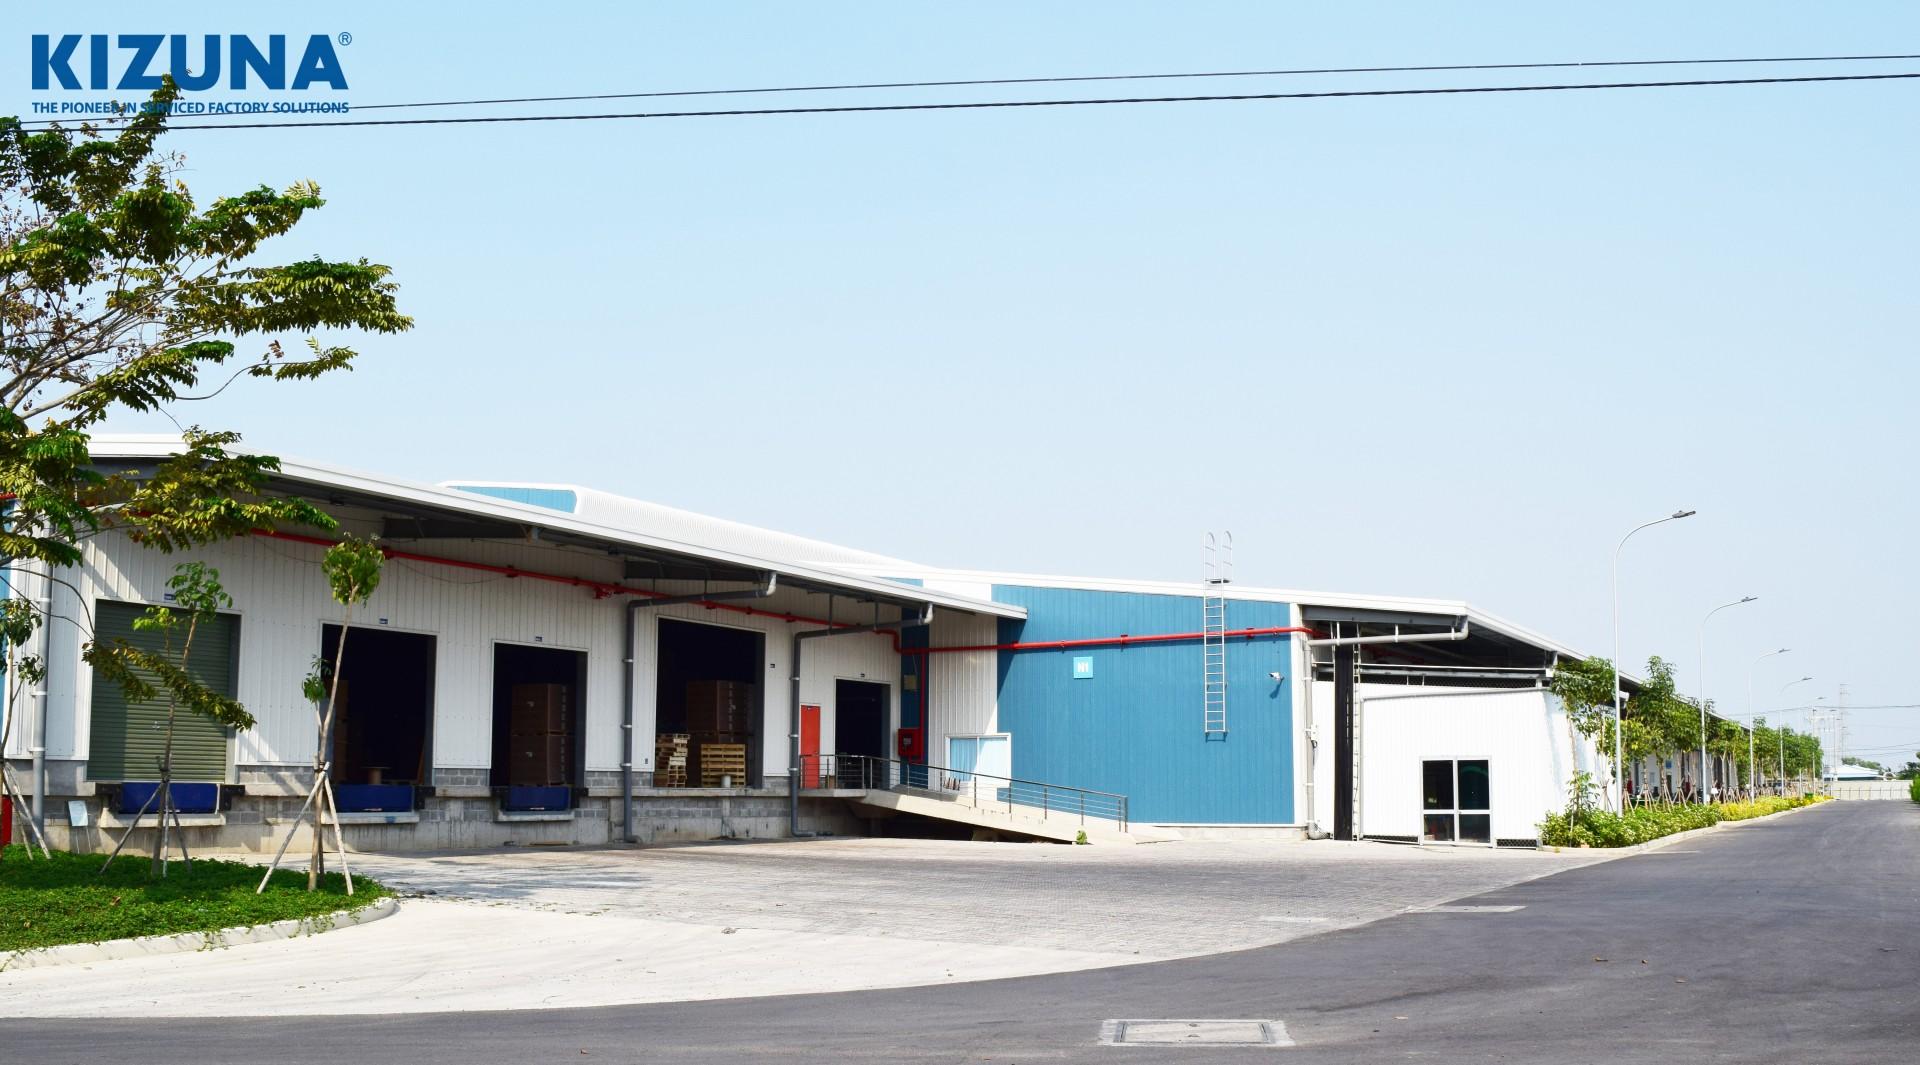 medium factory